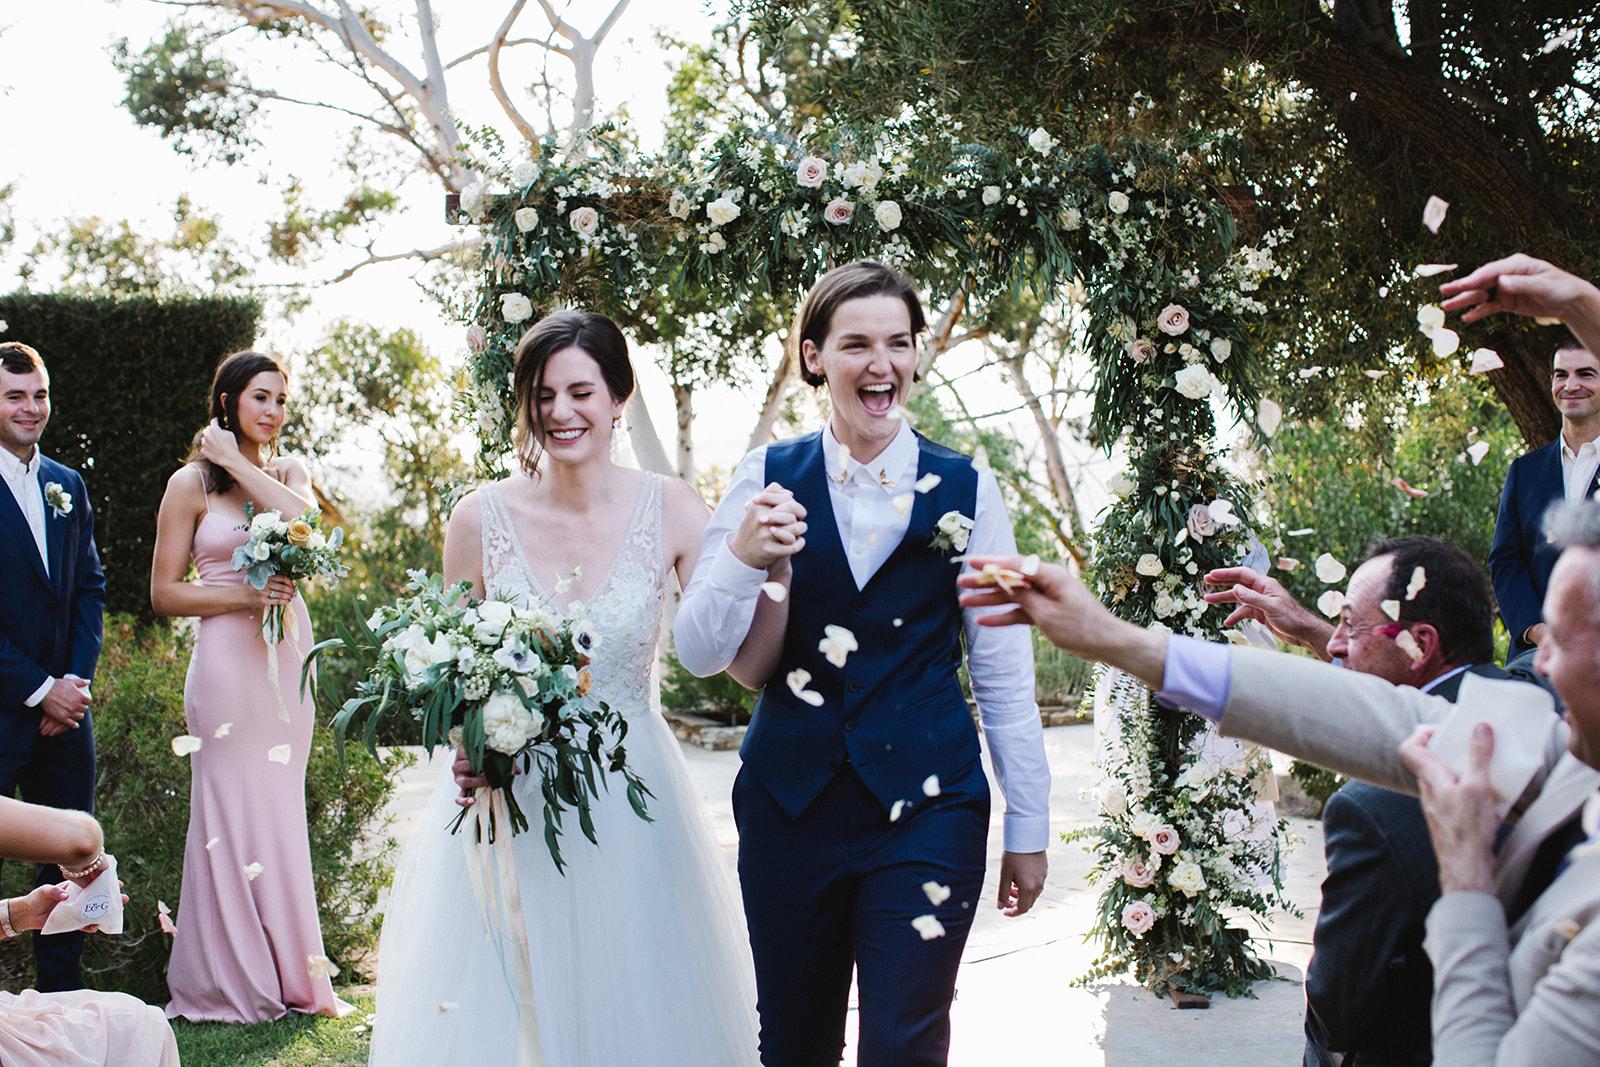 Wedding_Ceremony_Petal_Toss